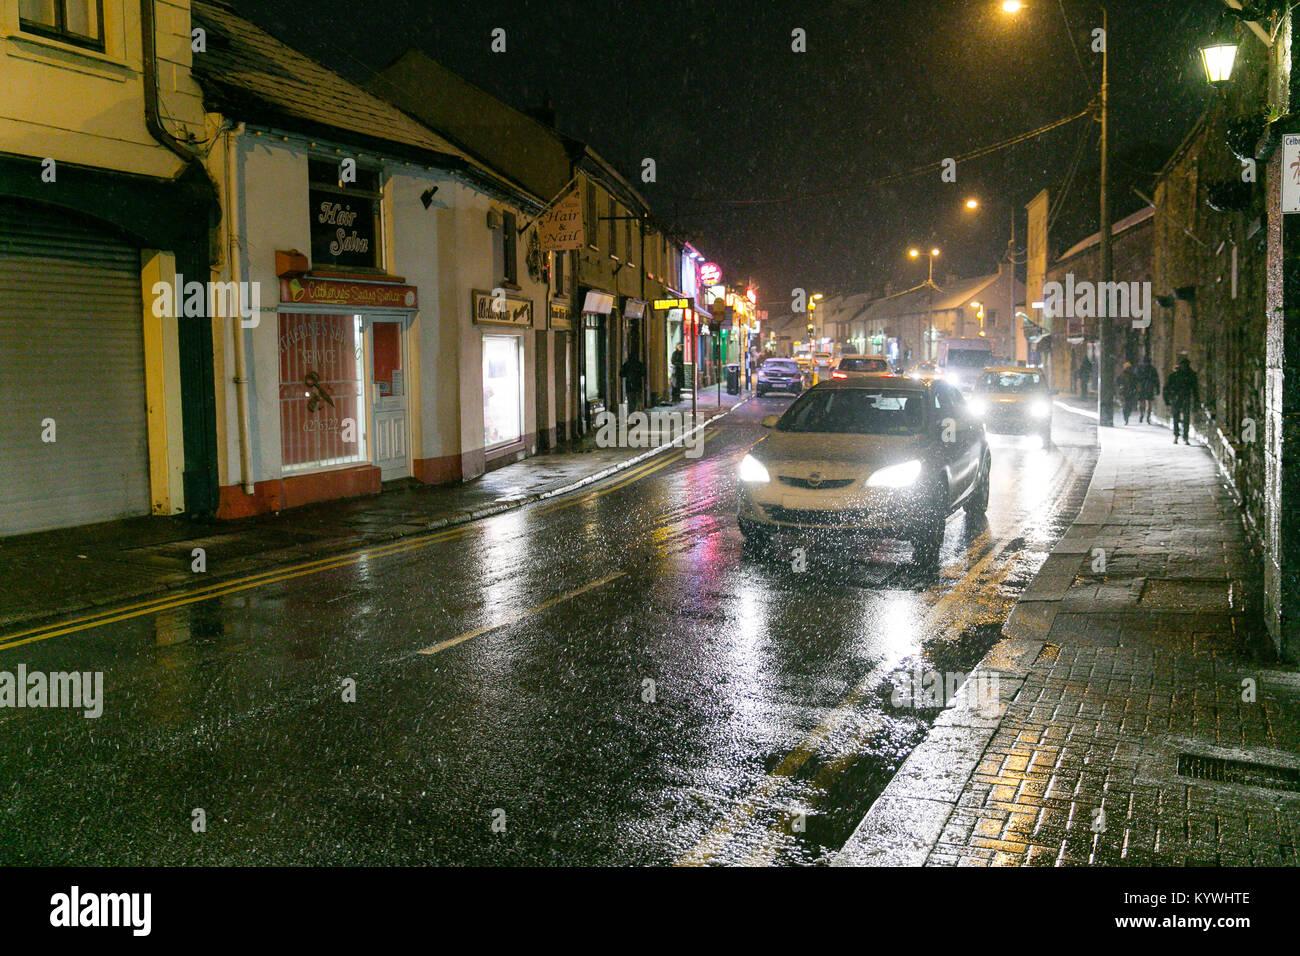 Celbridge - Kildare County Council